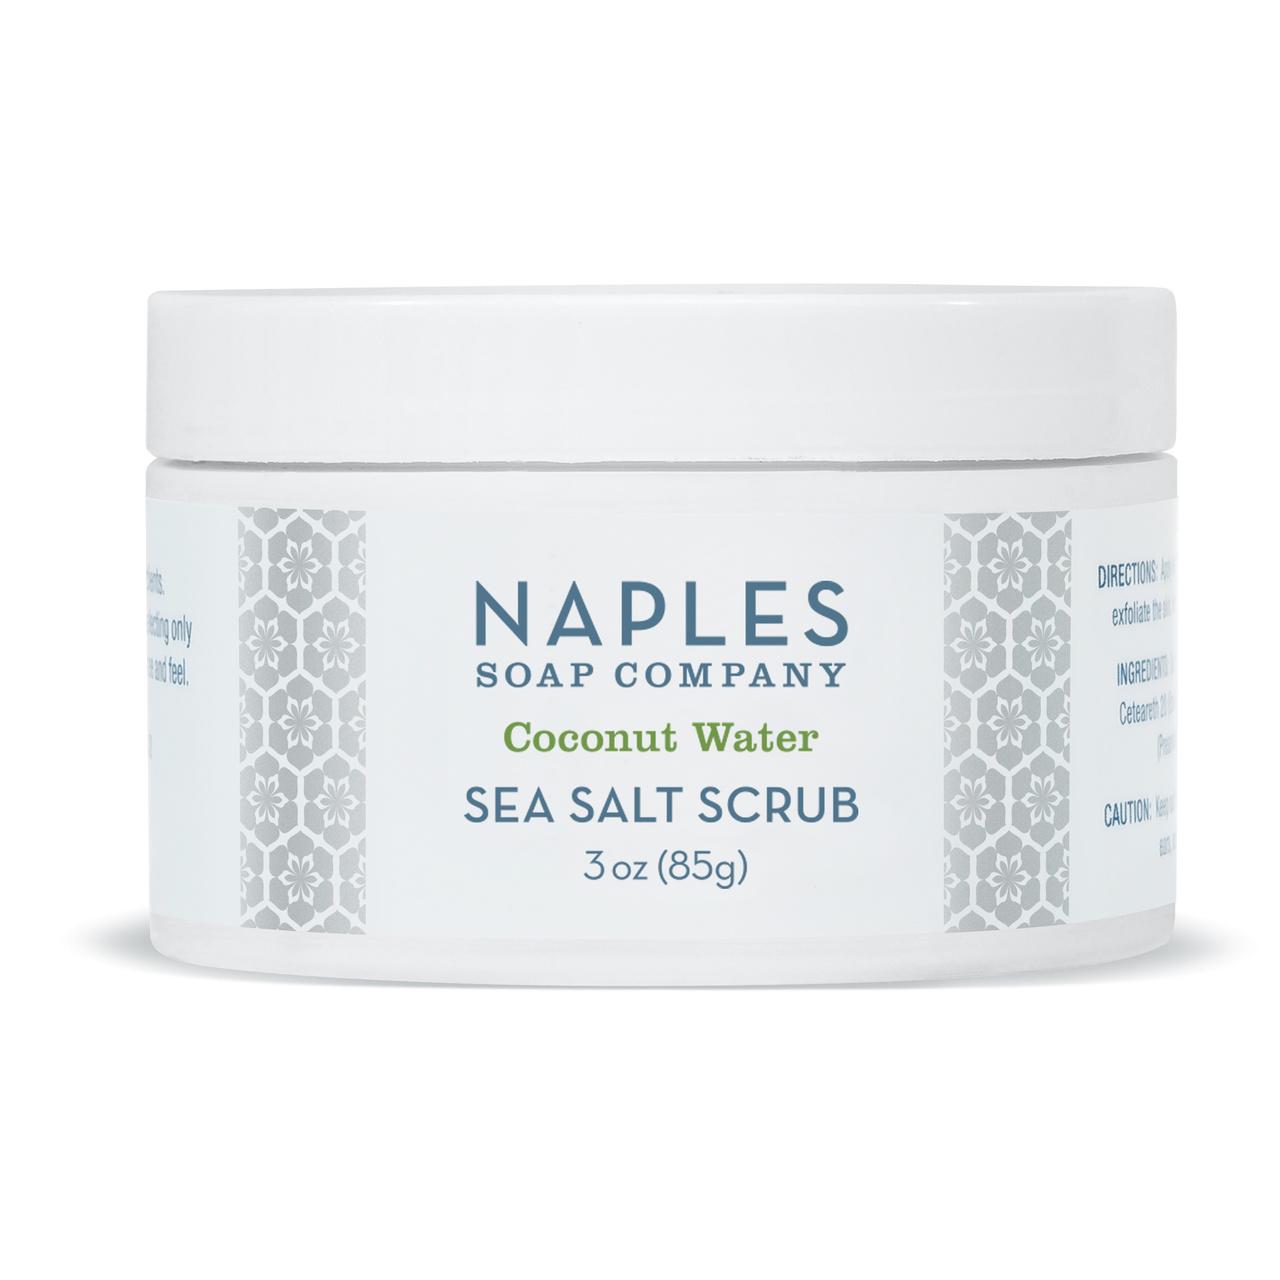 Naples Soap Co. Coconut Water Sea Salt Scrub 3 oz